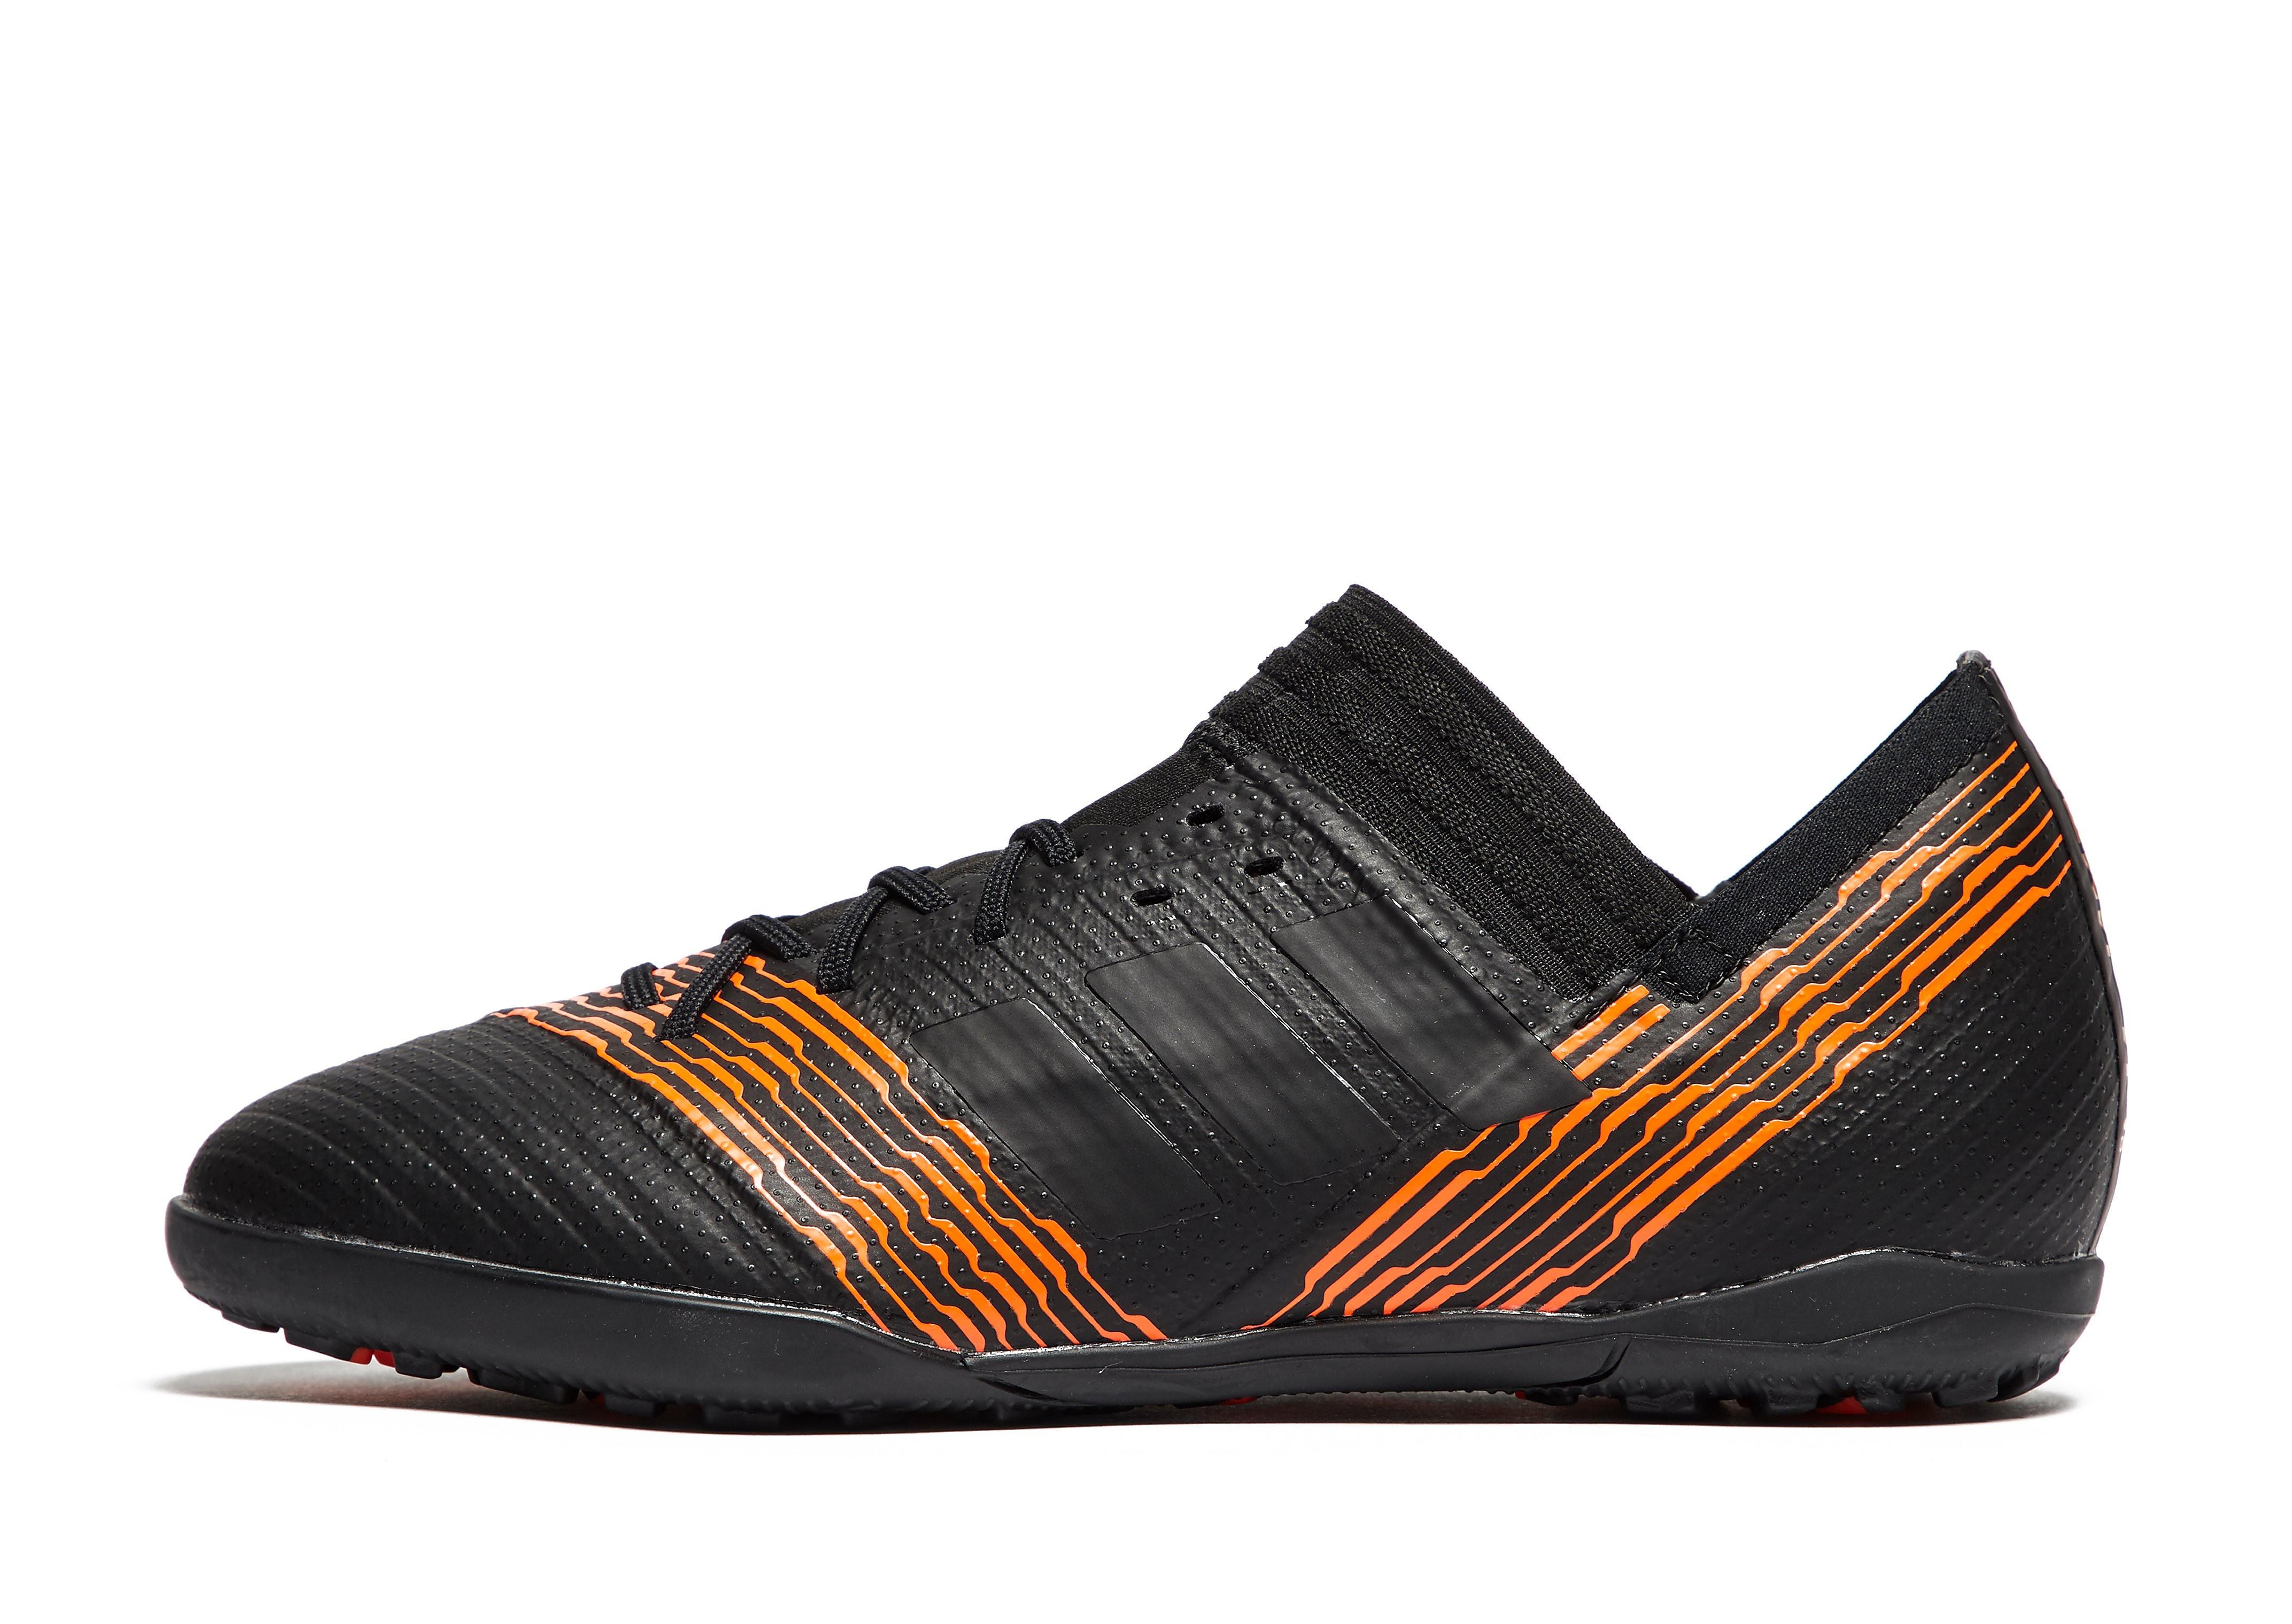 adidas SkyStalker Nemeziz 17.3 TF Junior